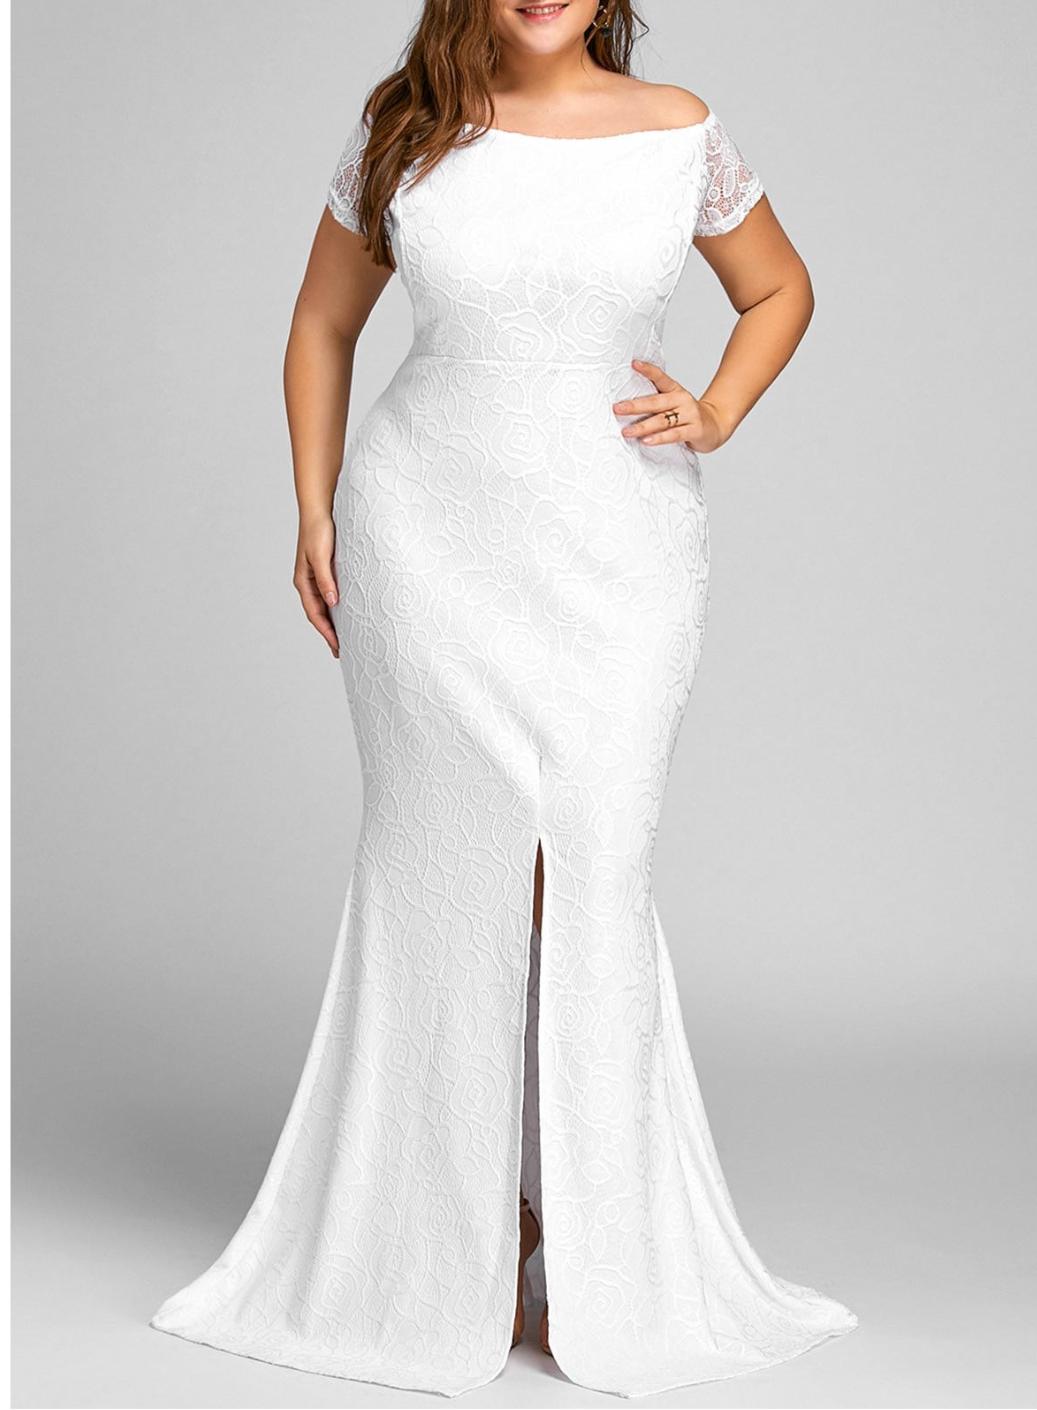 Loja Online Rosegal | Dicas De Vestidos Branco